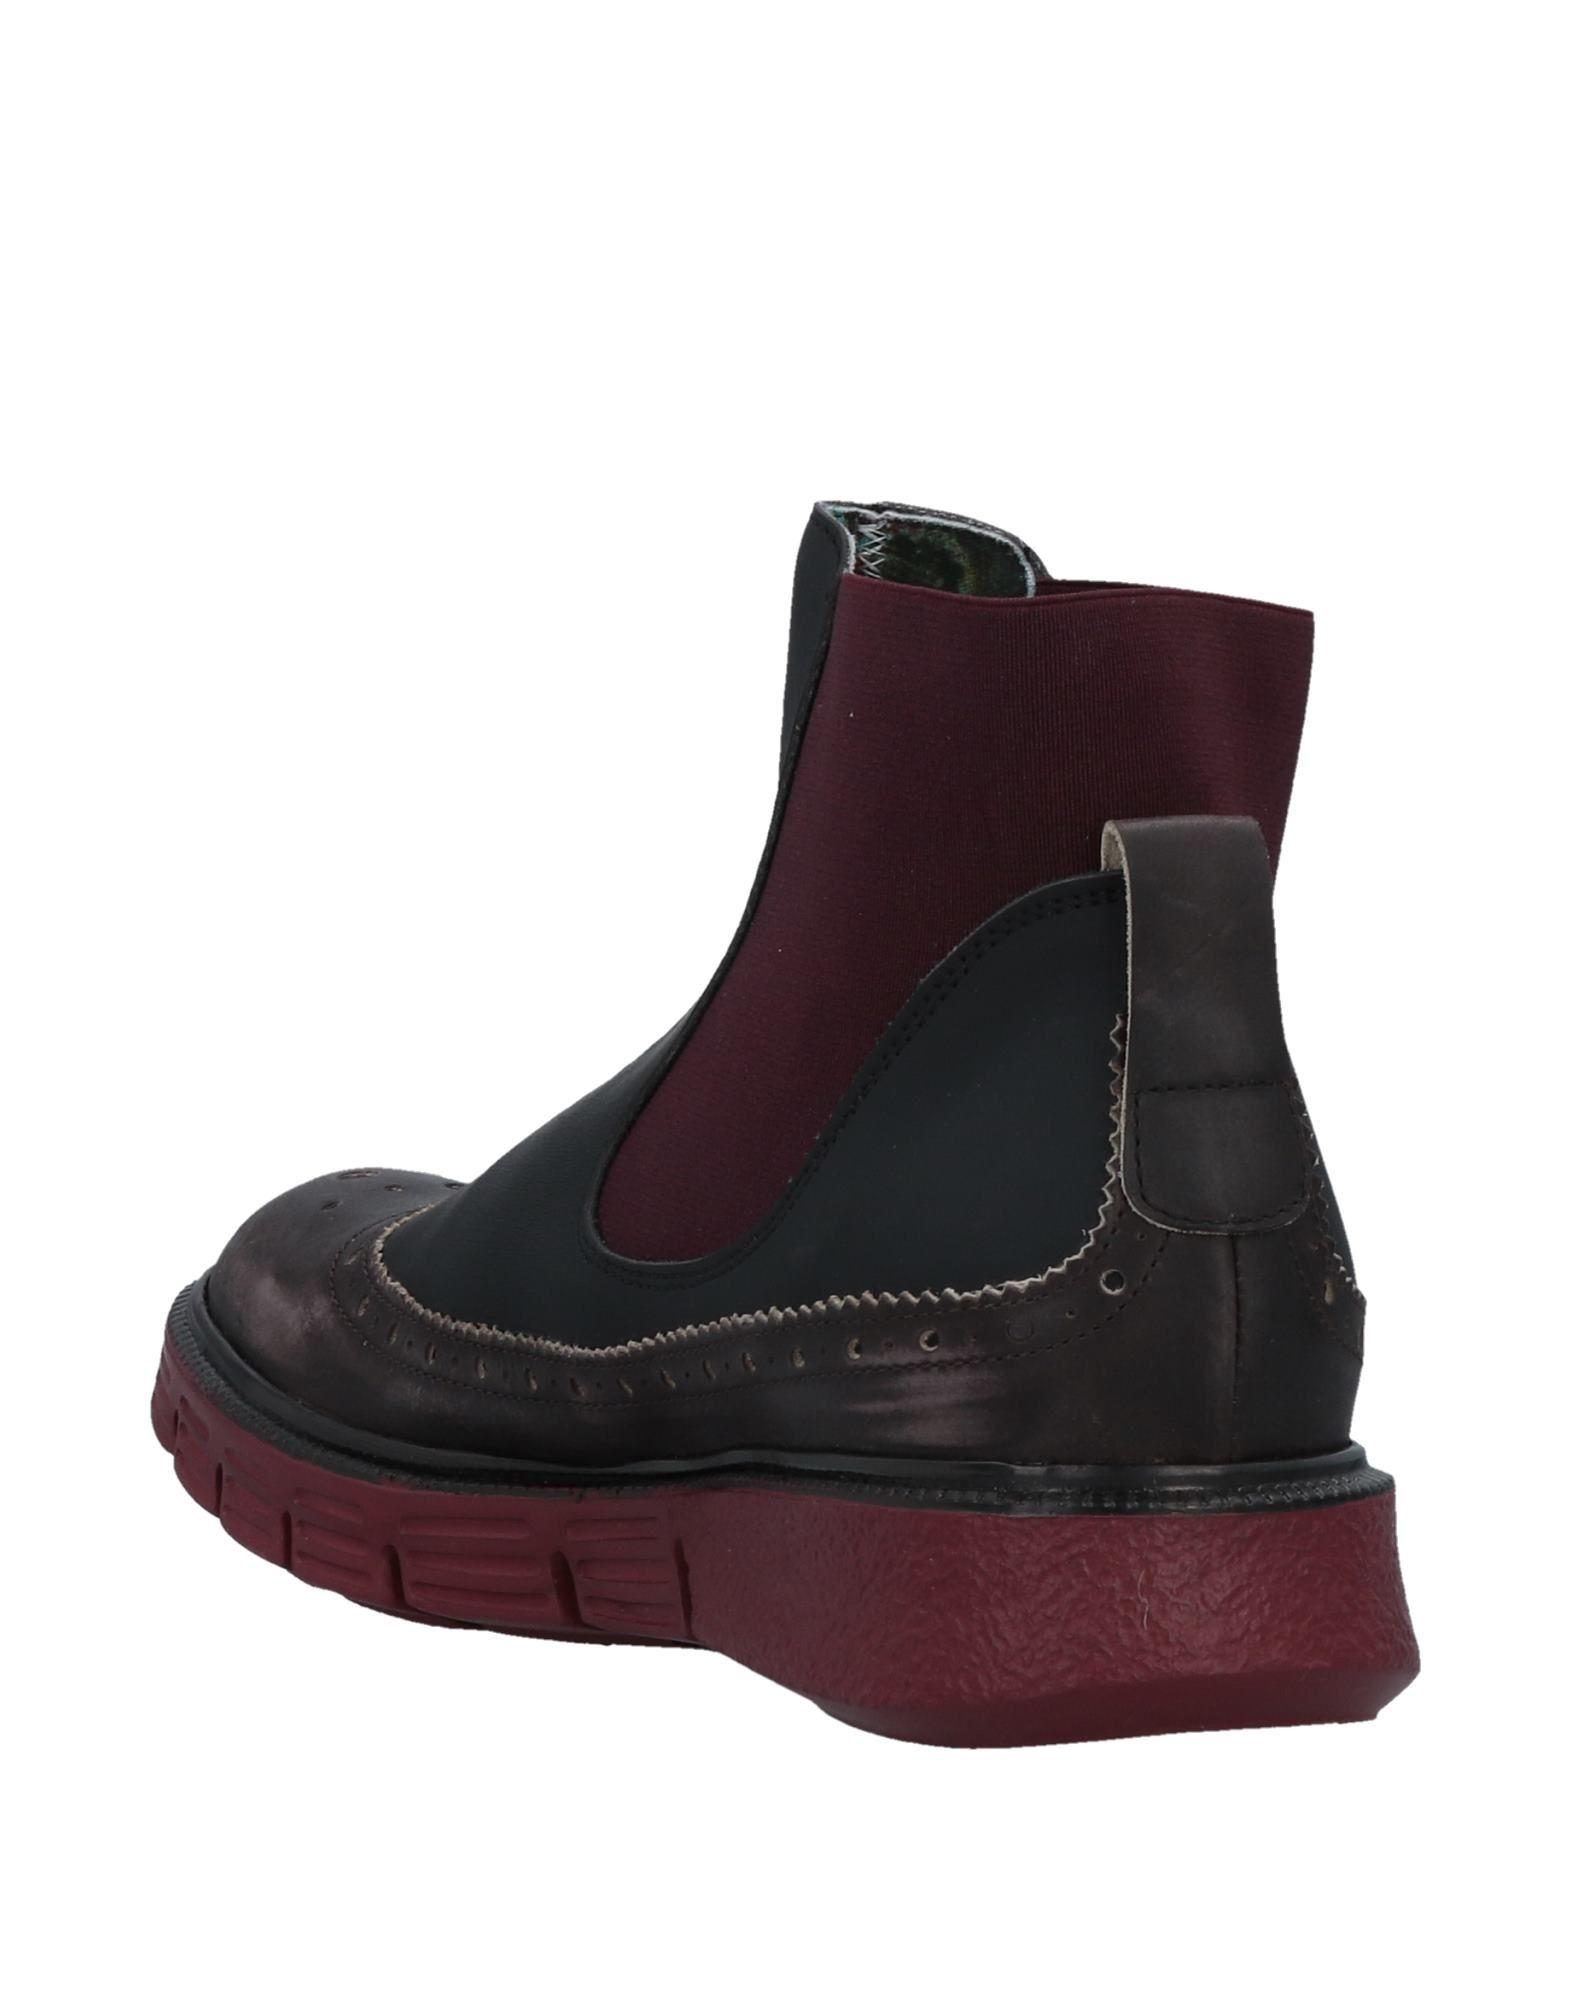 Stilvolle billige Schuhe Yab Yab Schuhe Stiefelette Damen  11508156VE 51212e